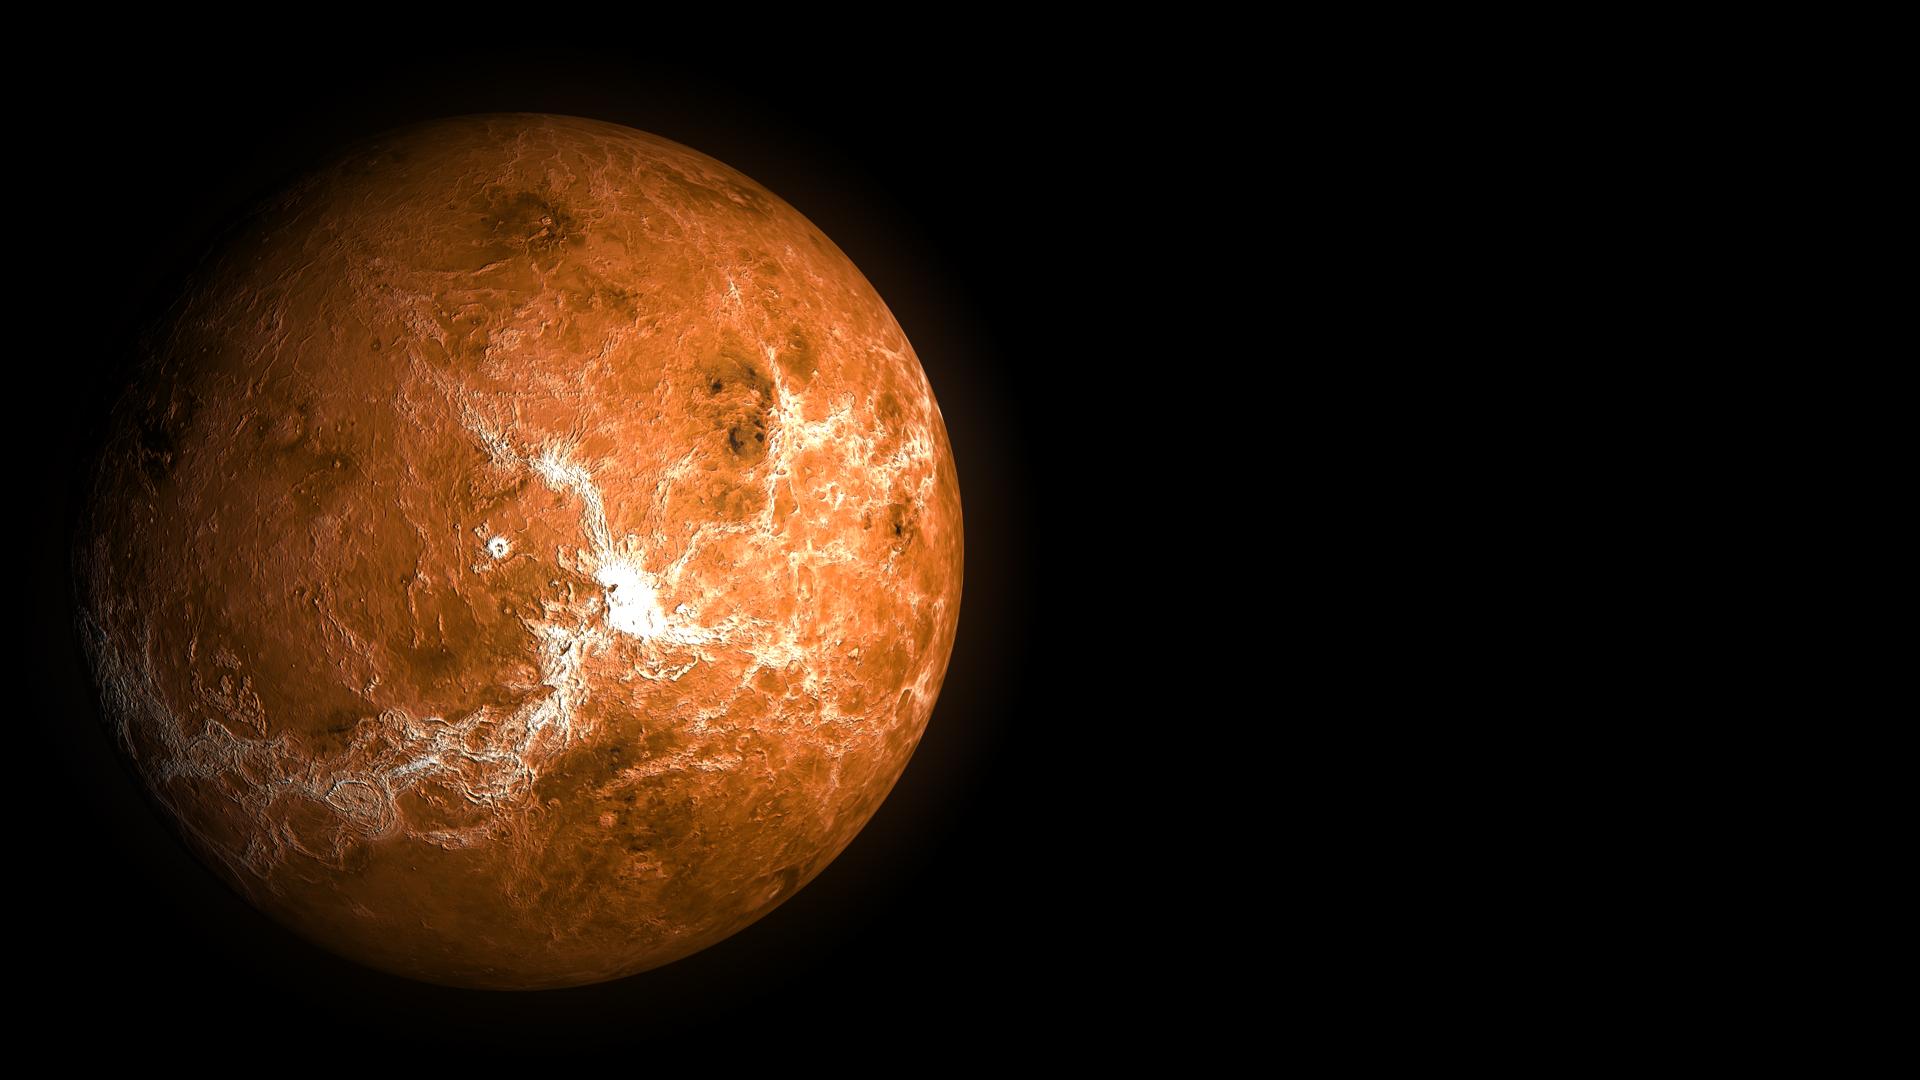 Venus Planet HD Wallpaper 62406 1920x1080px 1920x1080